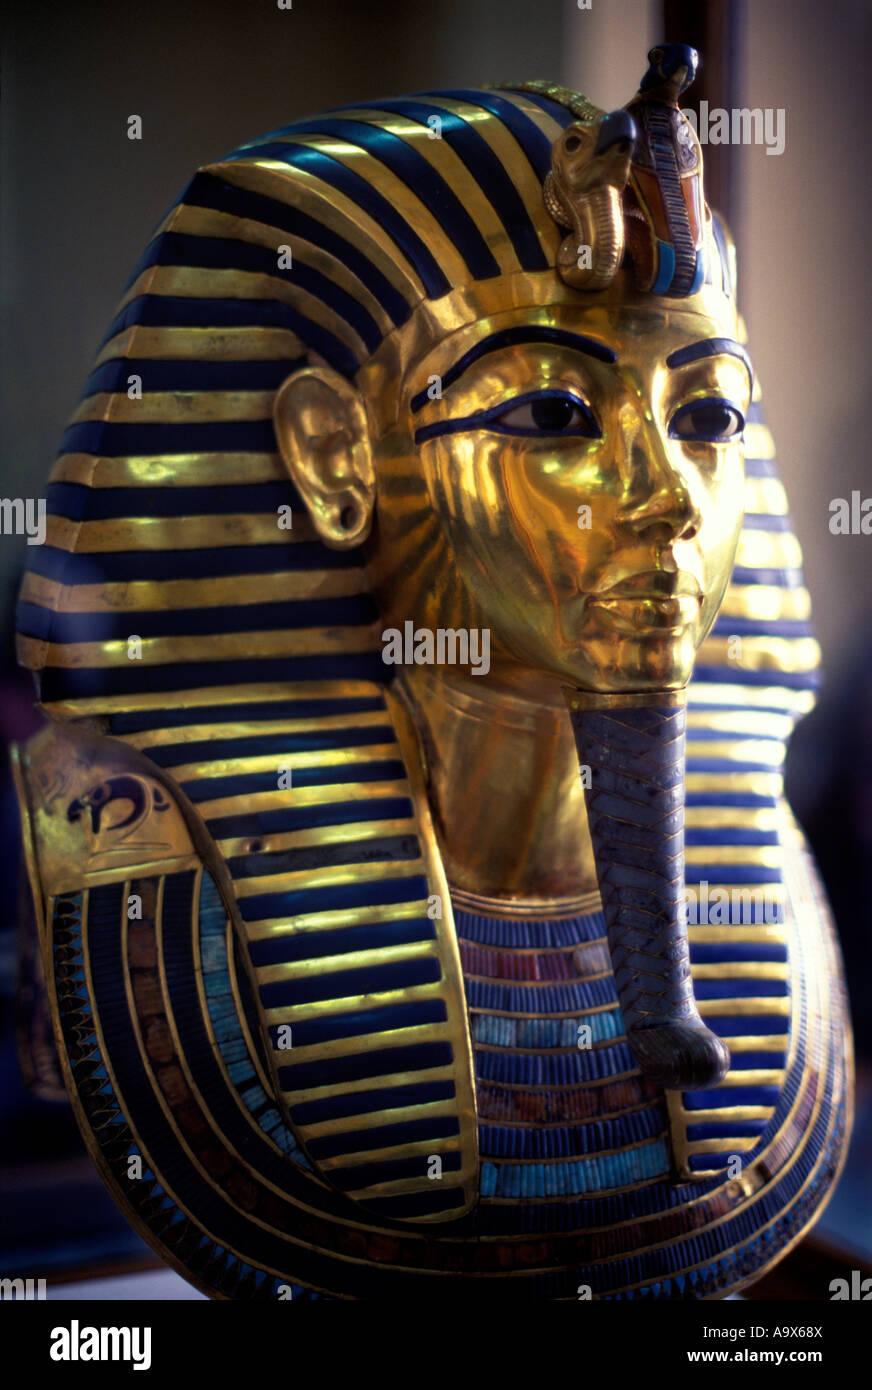 GOLDEN EFFIGY DEATH MASK OF PHARAOH TUTANKHAMUN FACE EGYPTIAN ANTIQUITIES  MUSEUM CAIRO EGYPT - Stock Image